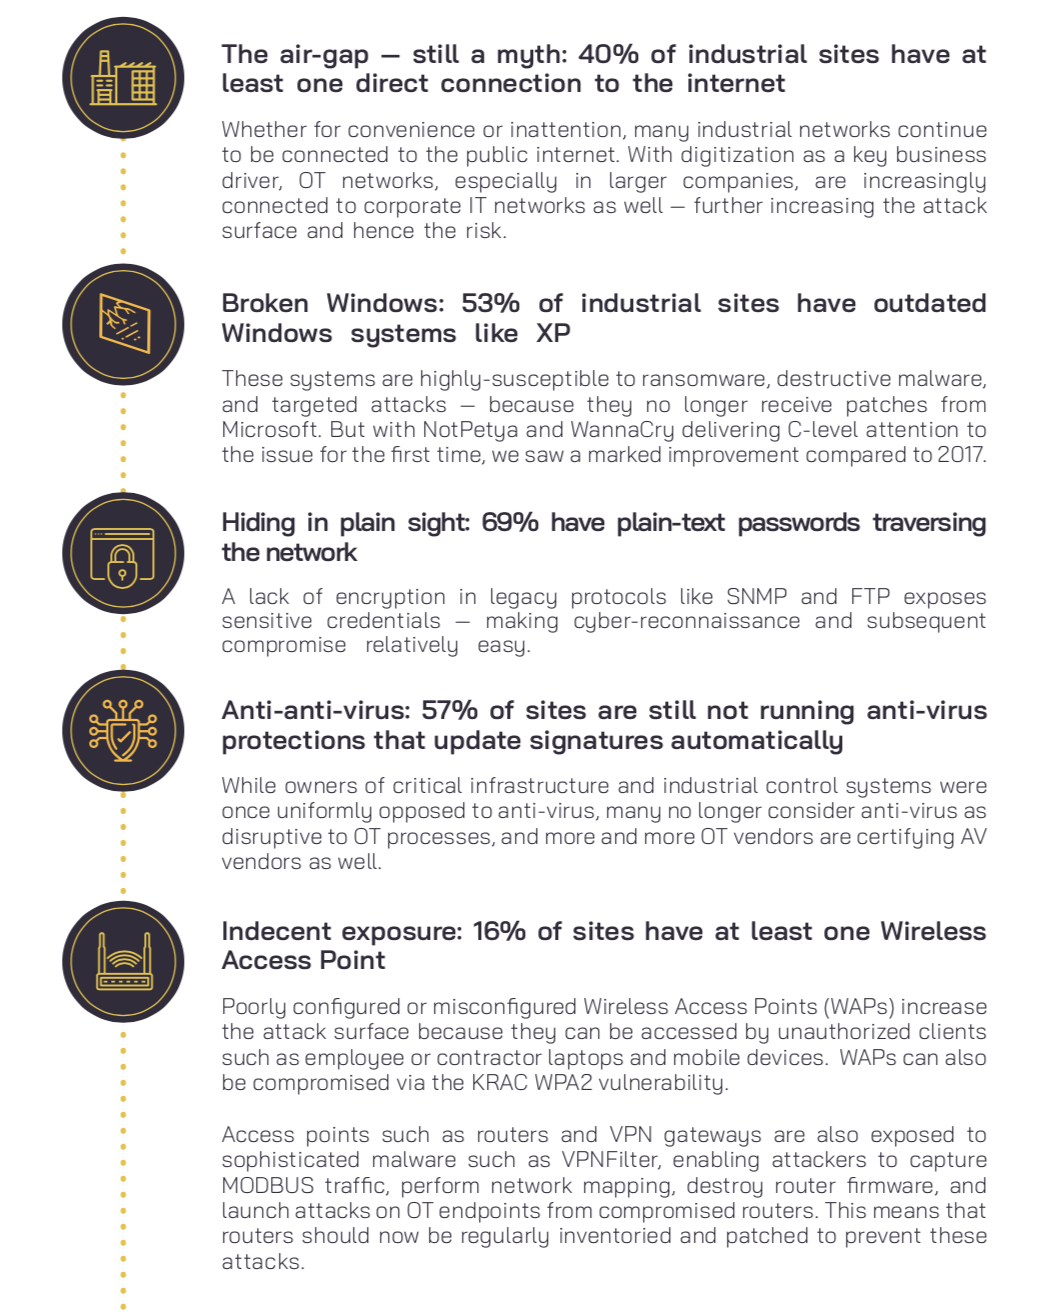 Released this week: Global ICS & IIoT Risk Report